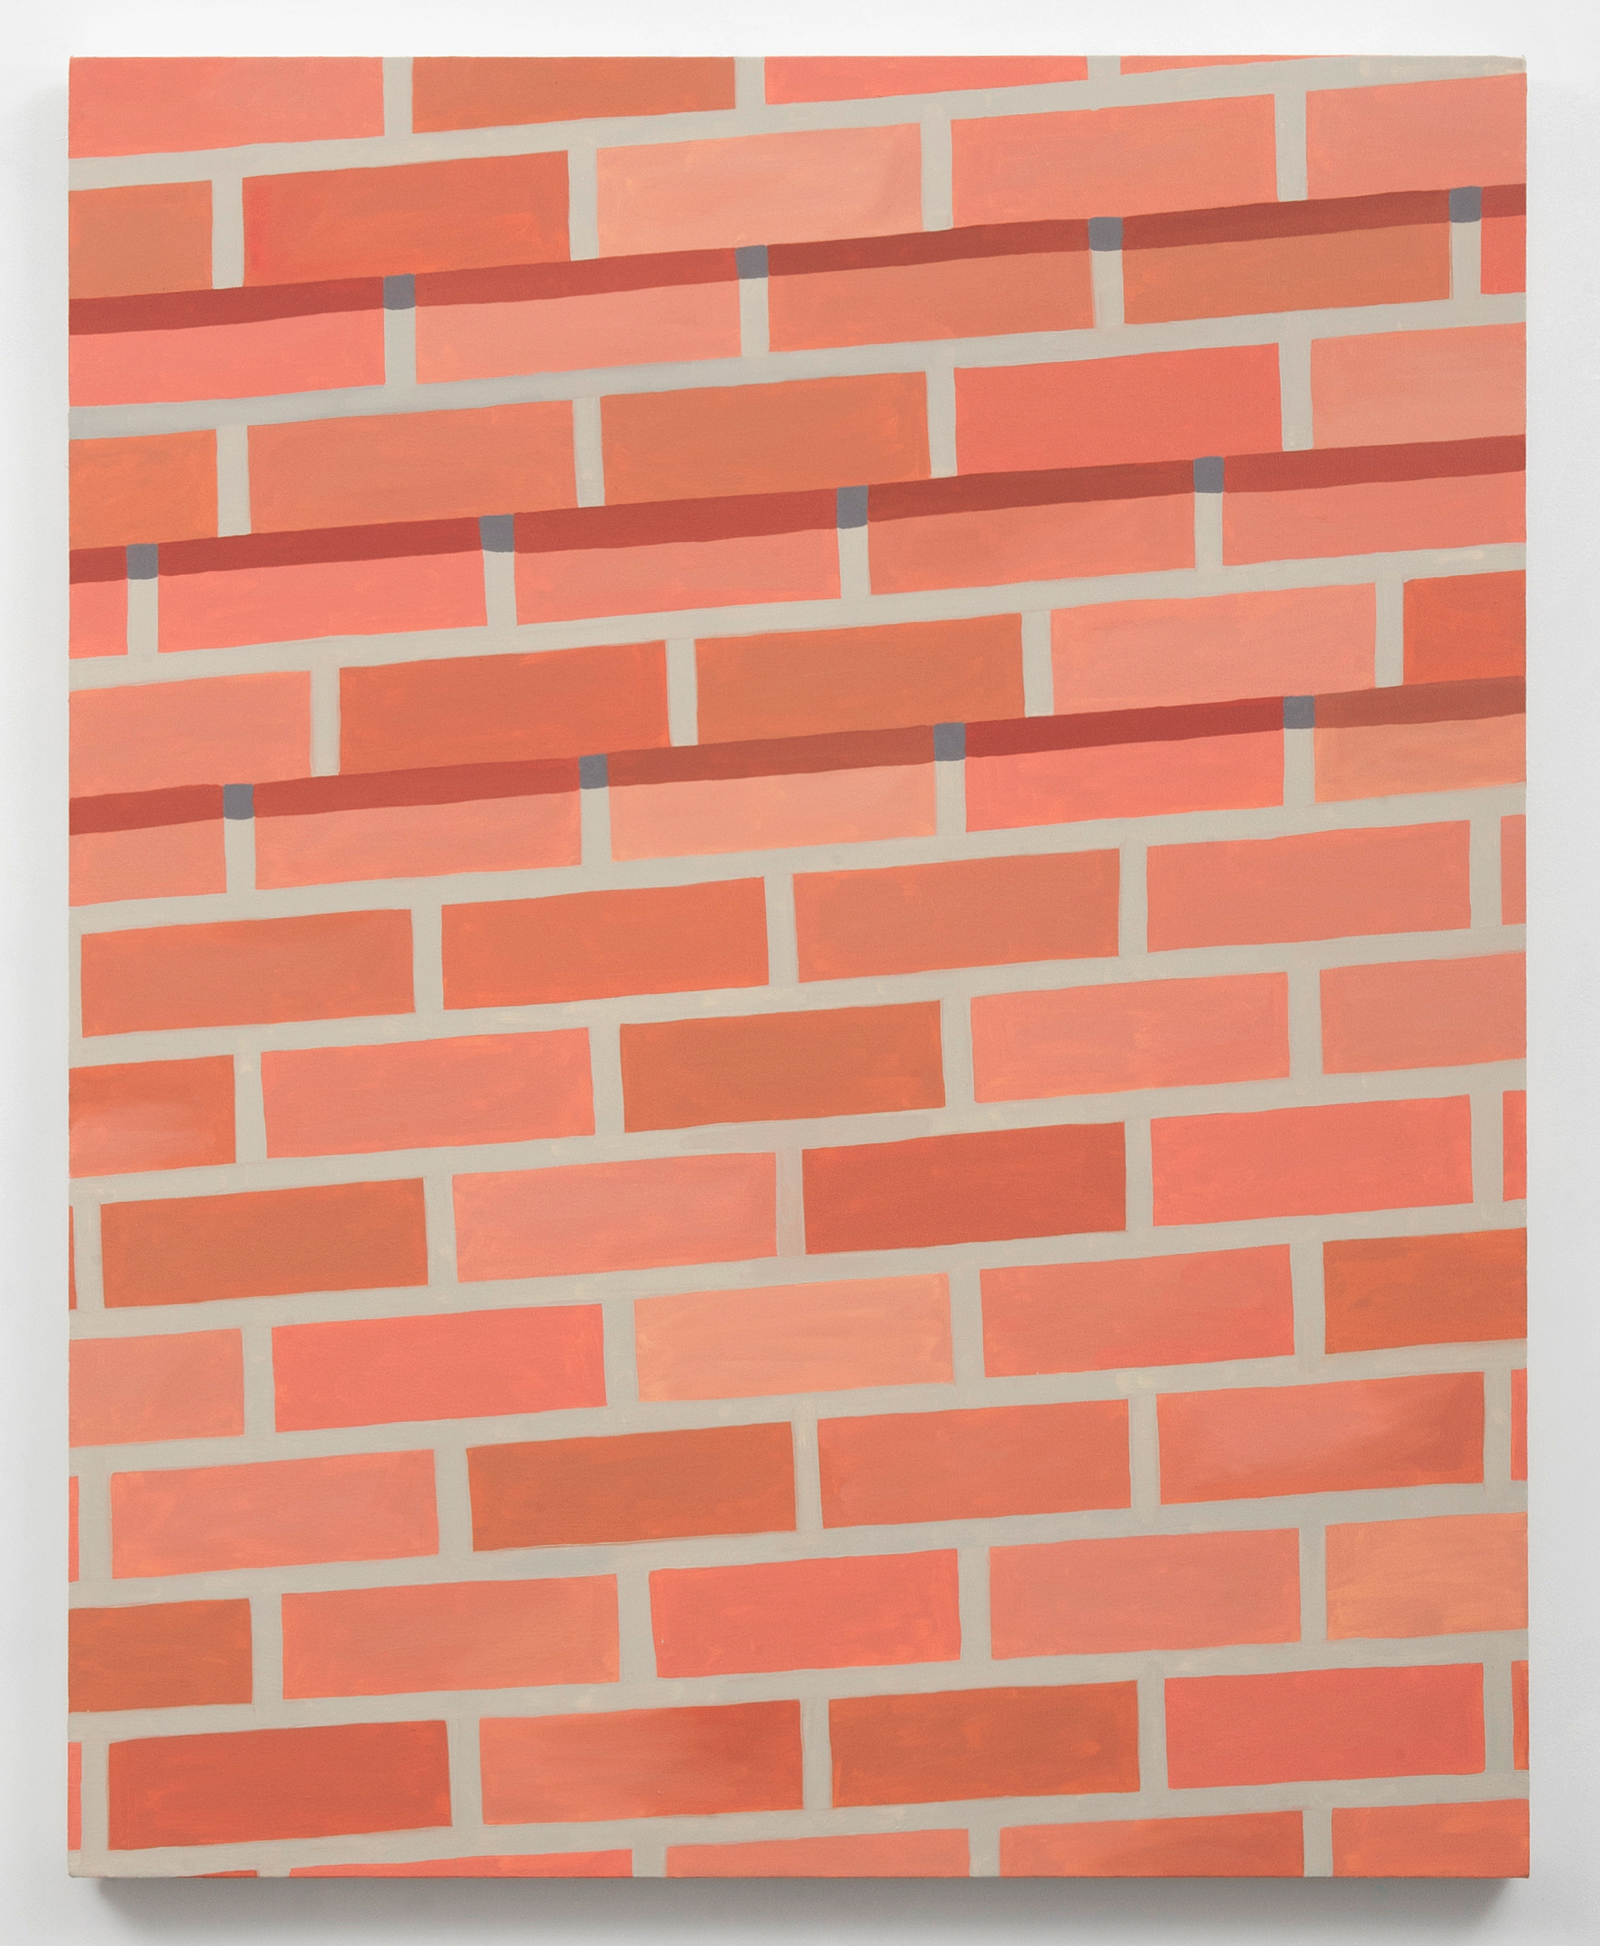 Corydon Cowansage, Wall #1, 2014, 40 x 50 inches, oil on canvas